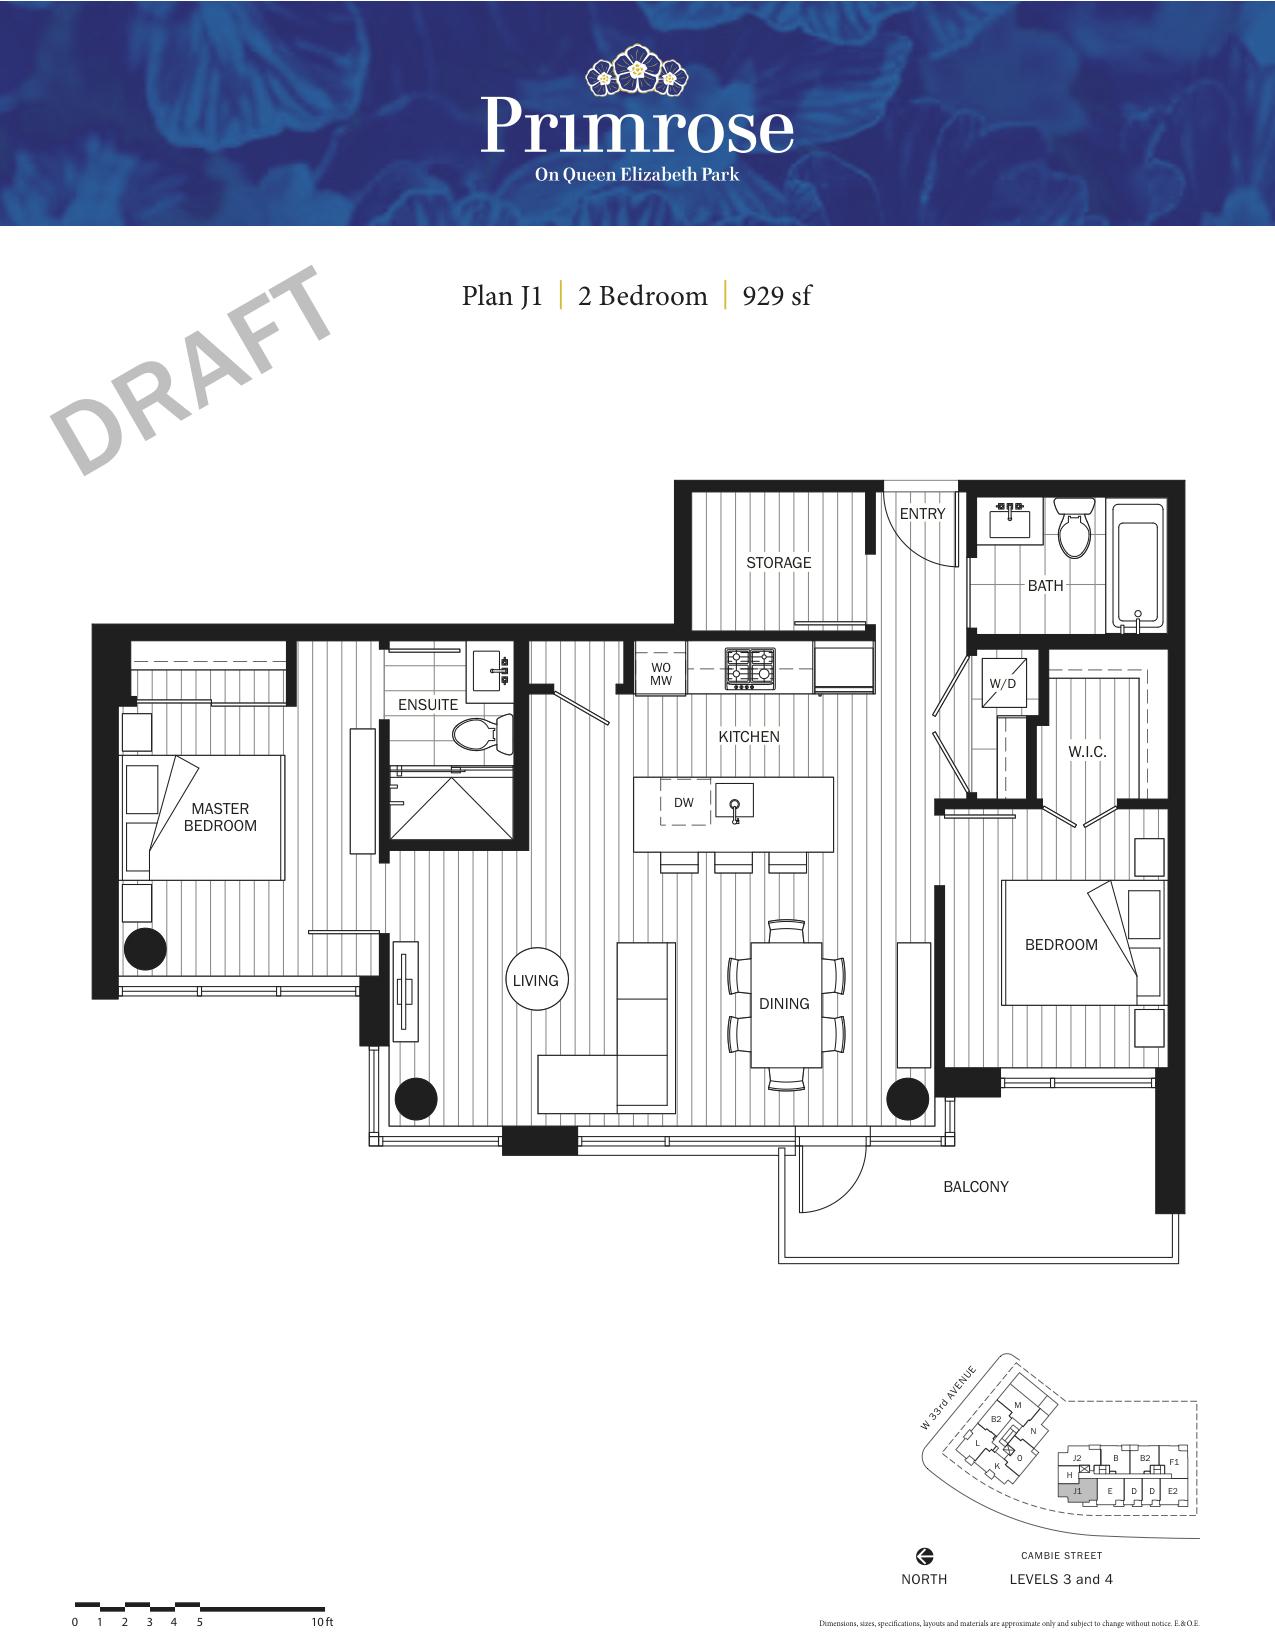 Primrose Floor Plan J1.